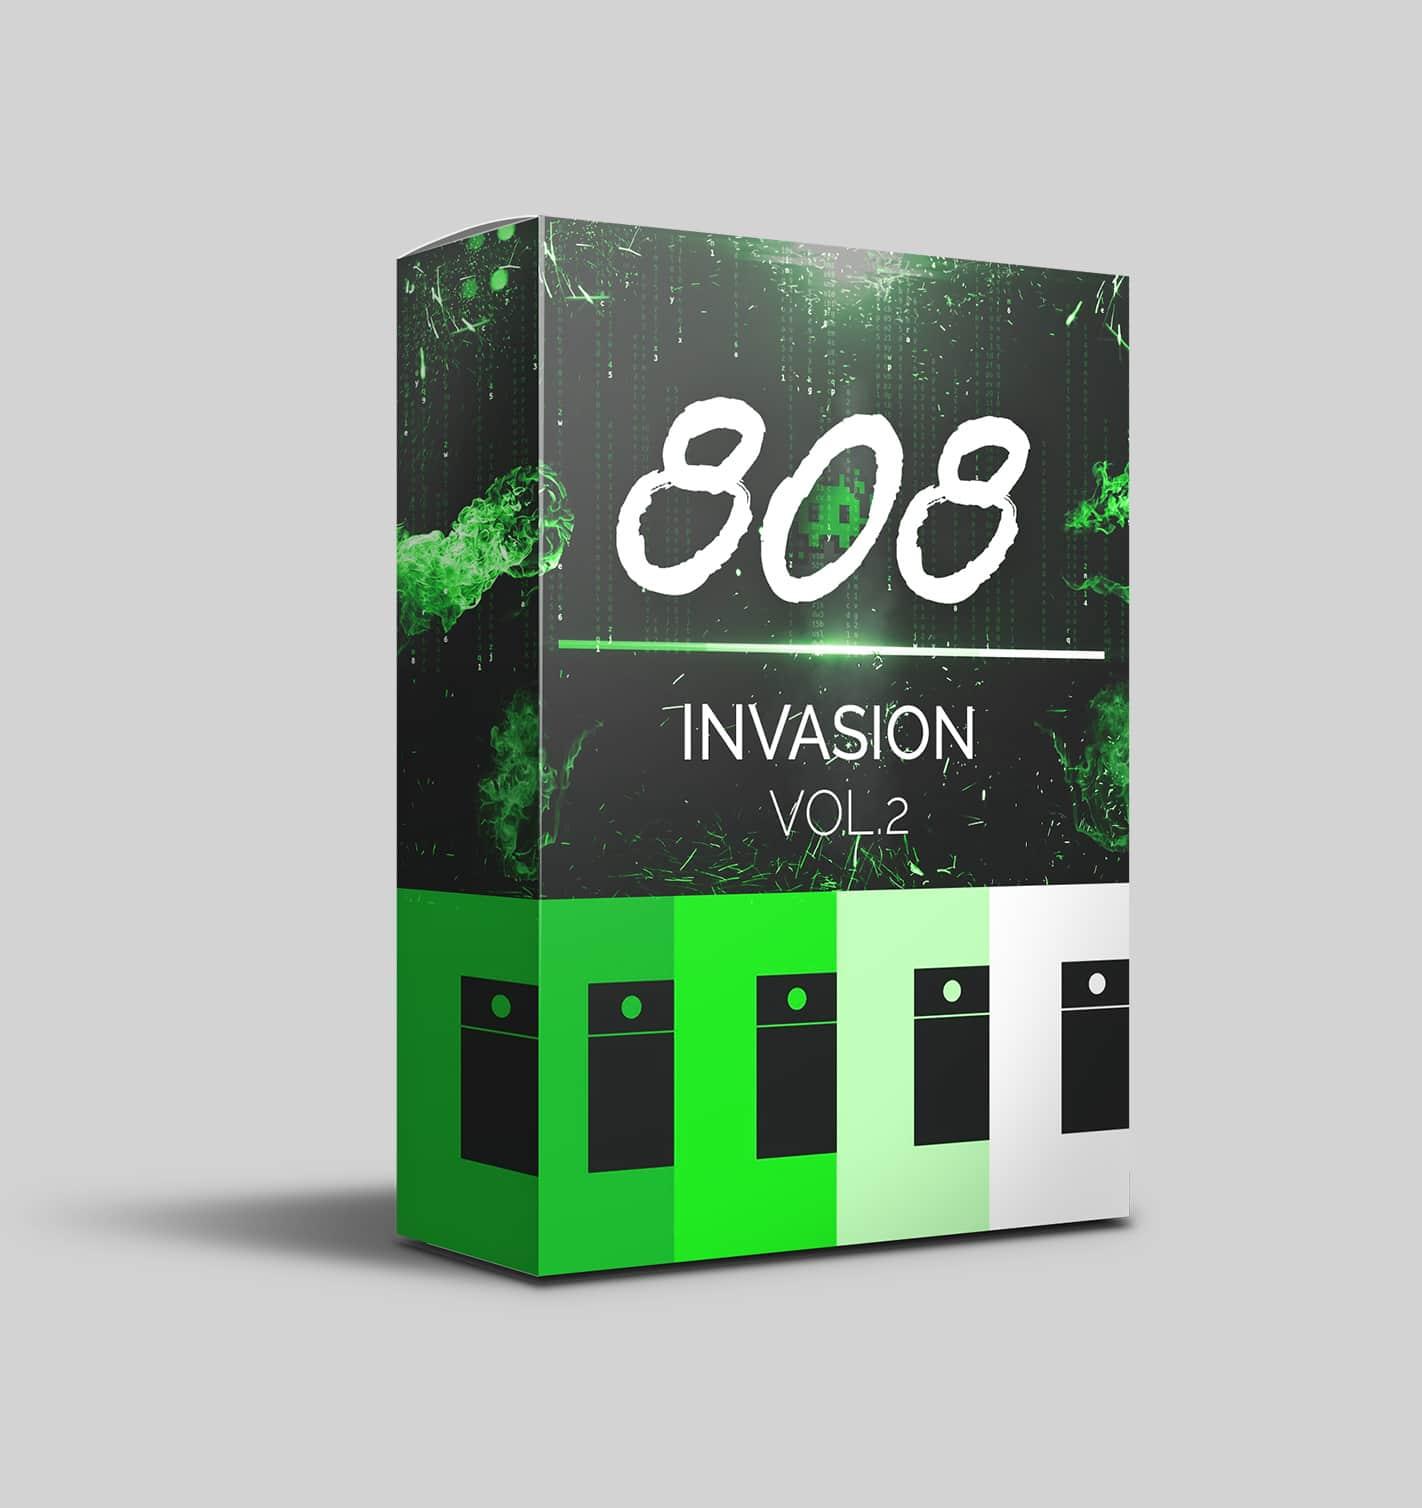 808 Invasion Vol.2 - 808 samples and MIDIs